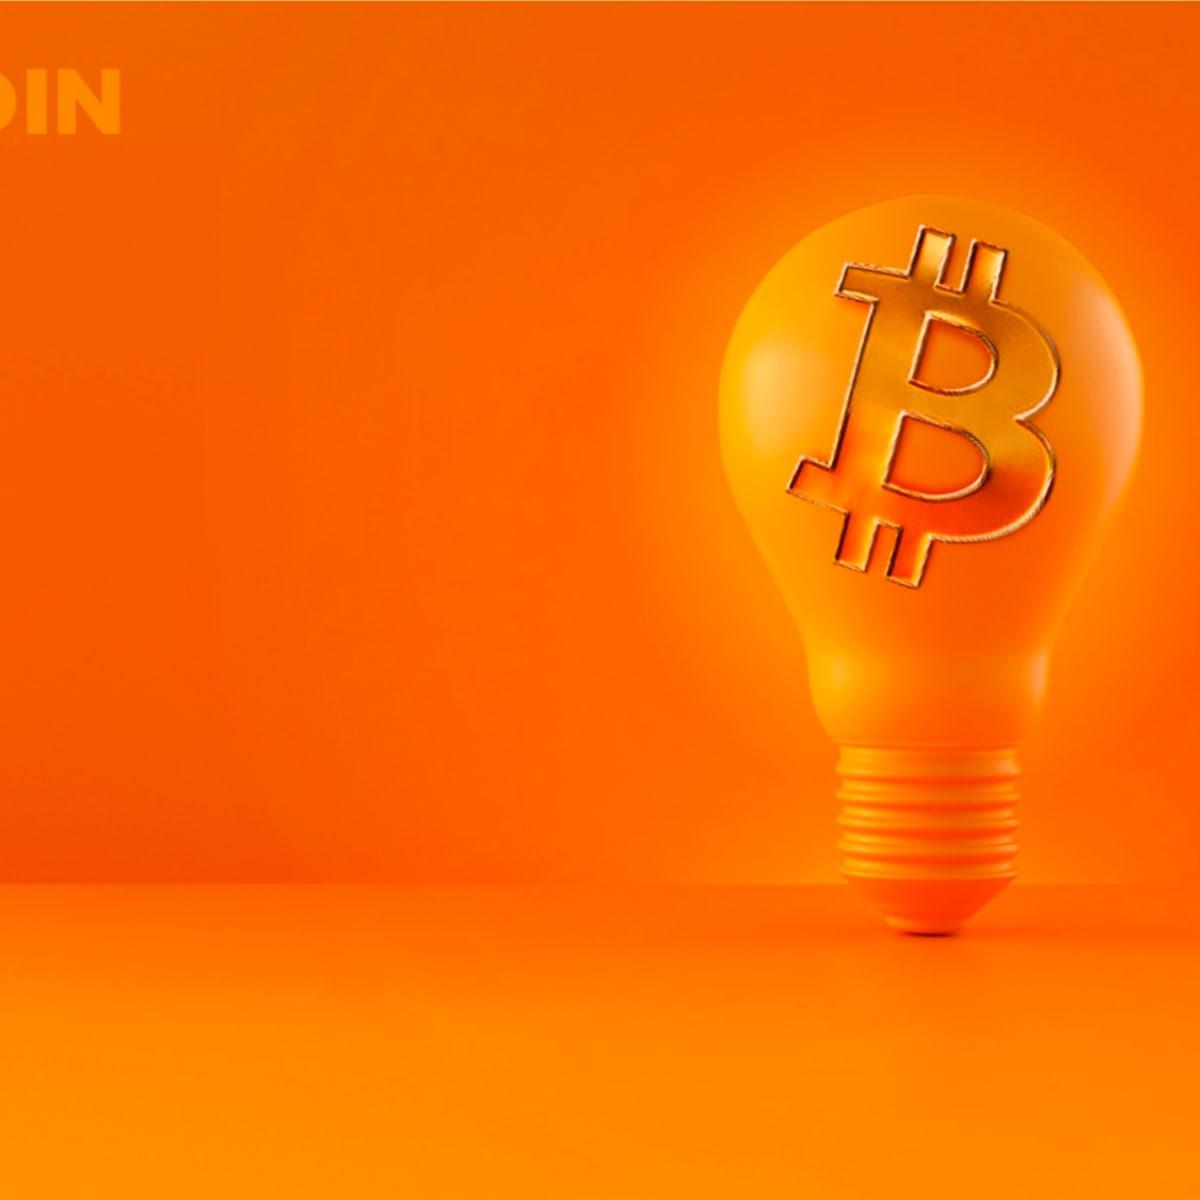 Framing Bitcoin For Progressives